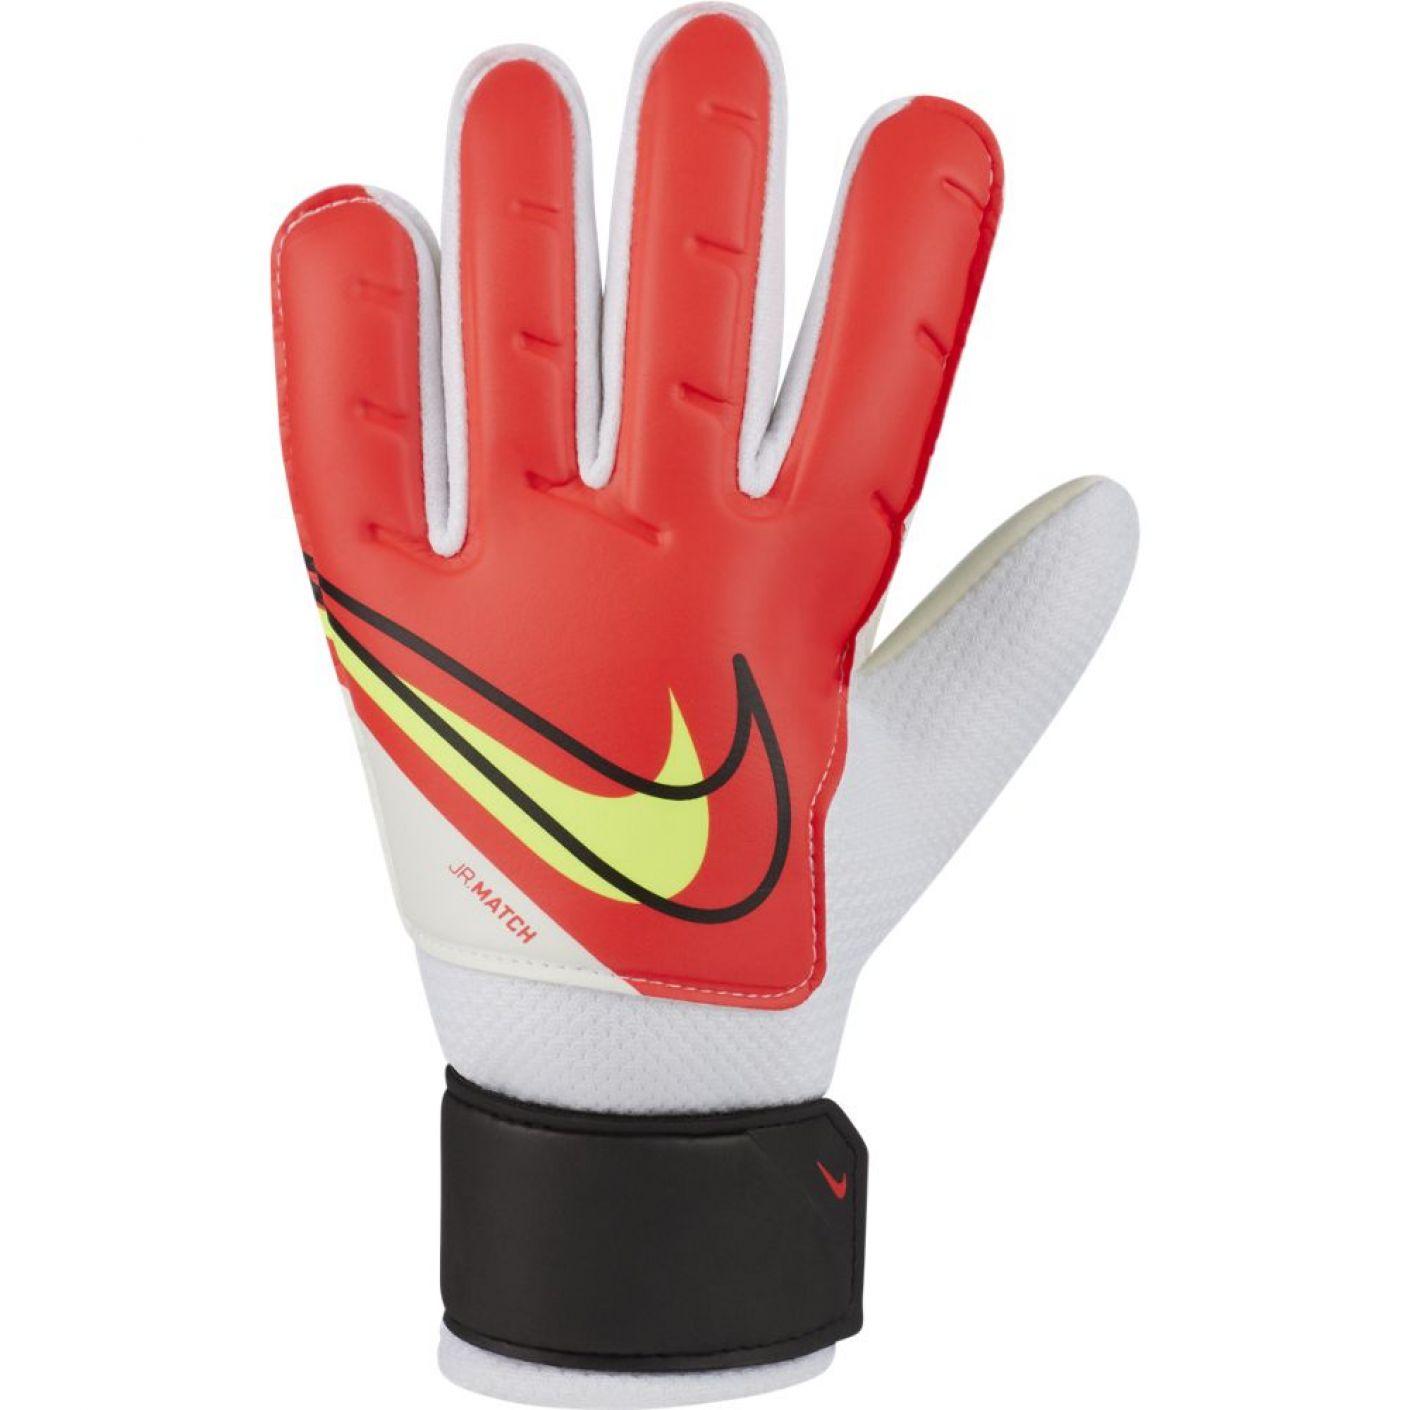 Nike Keepershandschoenen Match Kids Rood Zwart Geel